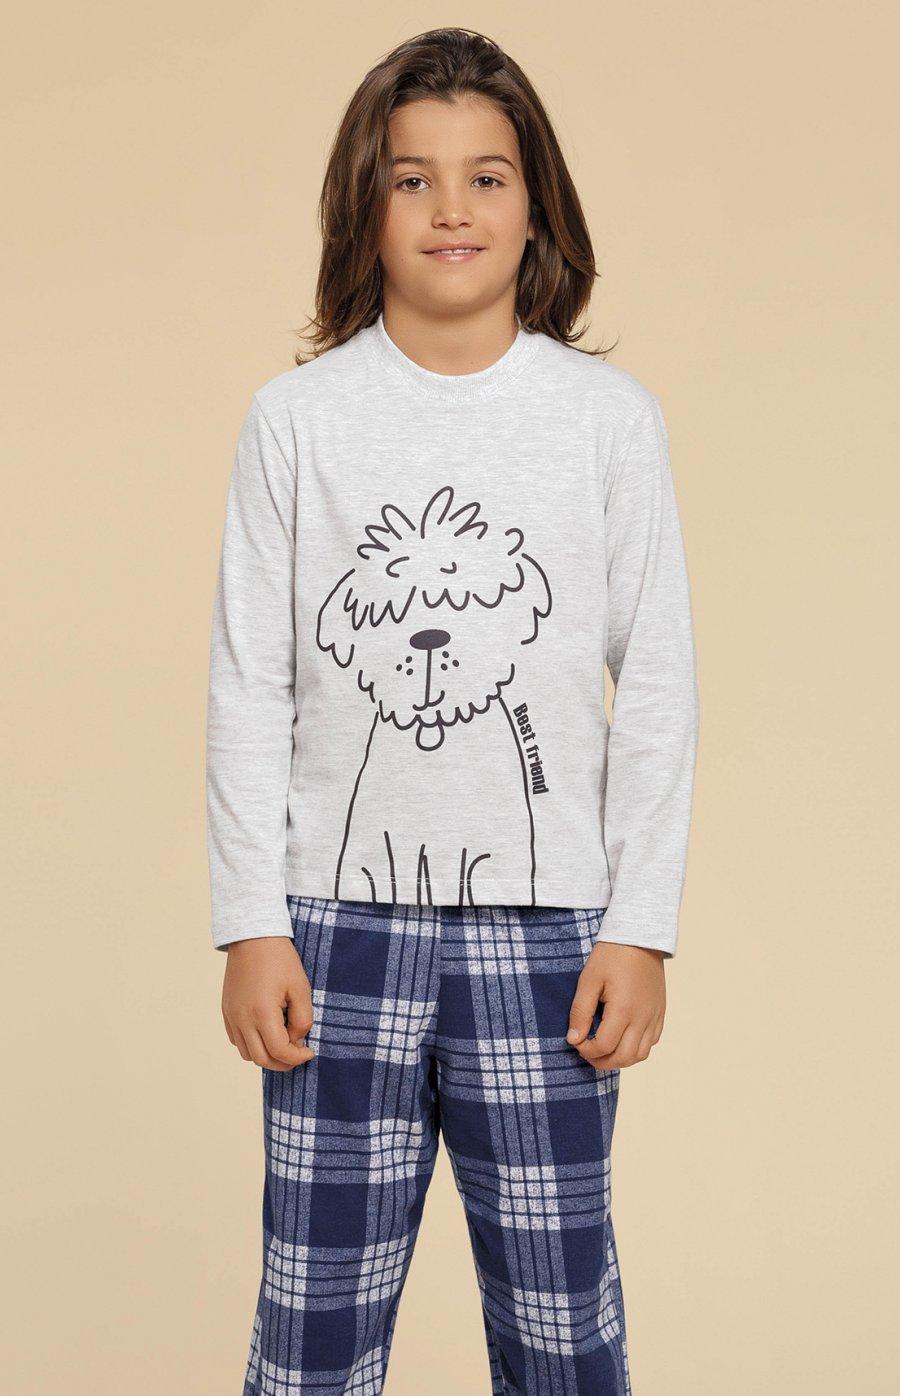 Pijama Infantil Meia Malha Family Dog Inverno 2019 CLOUD CLUB